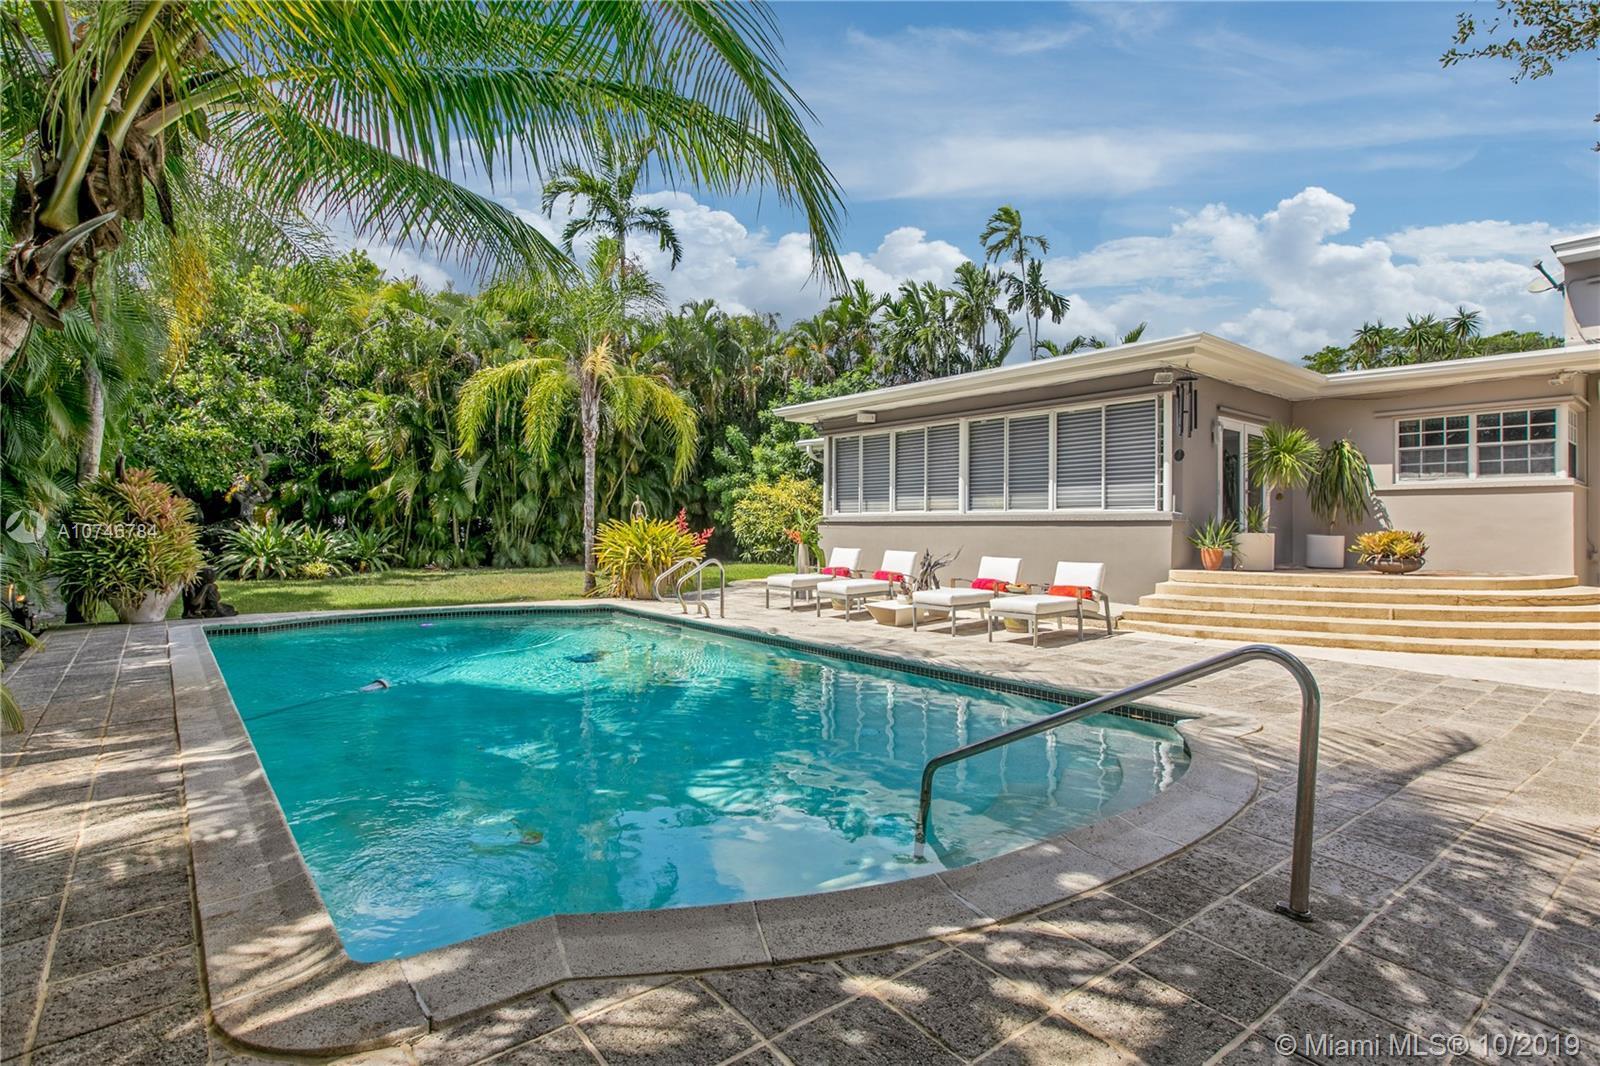 Miami Shores # - 23 - photo